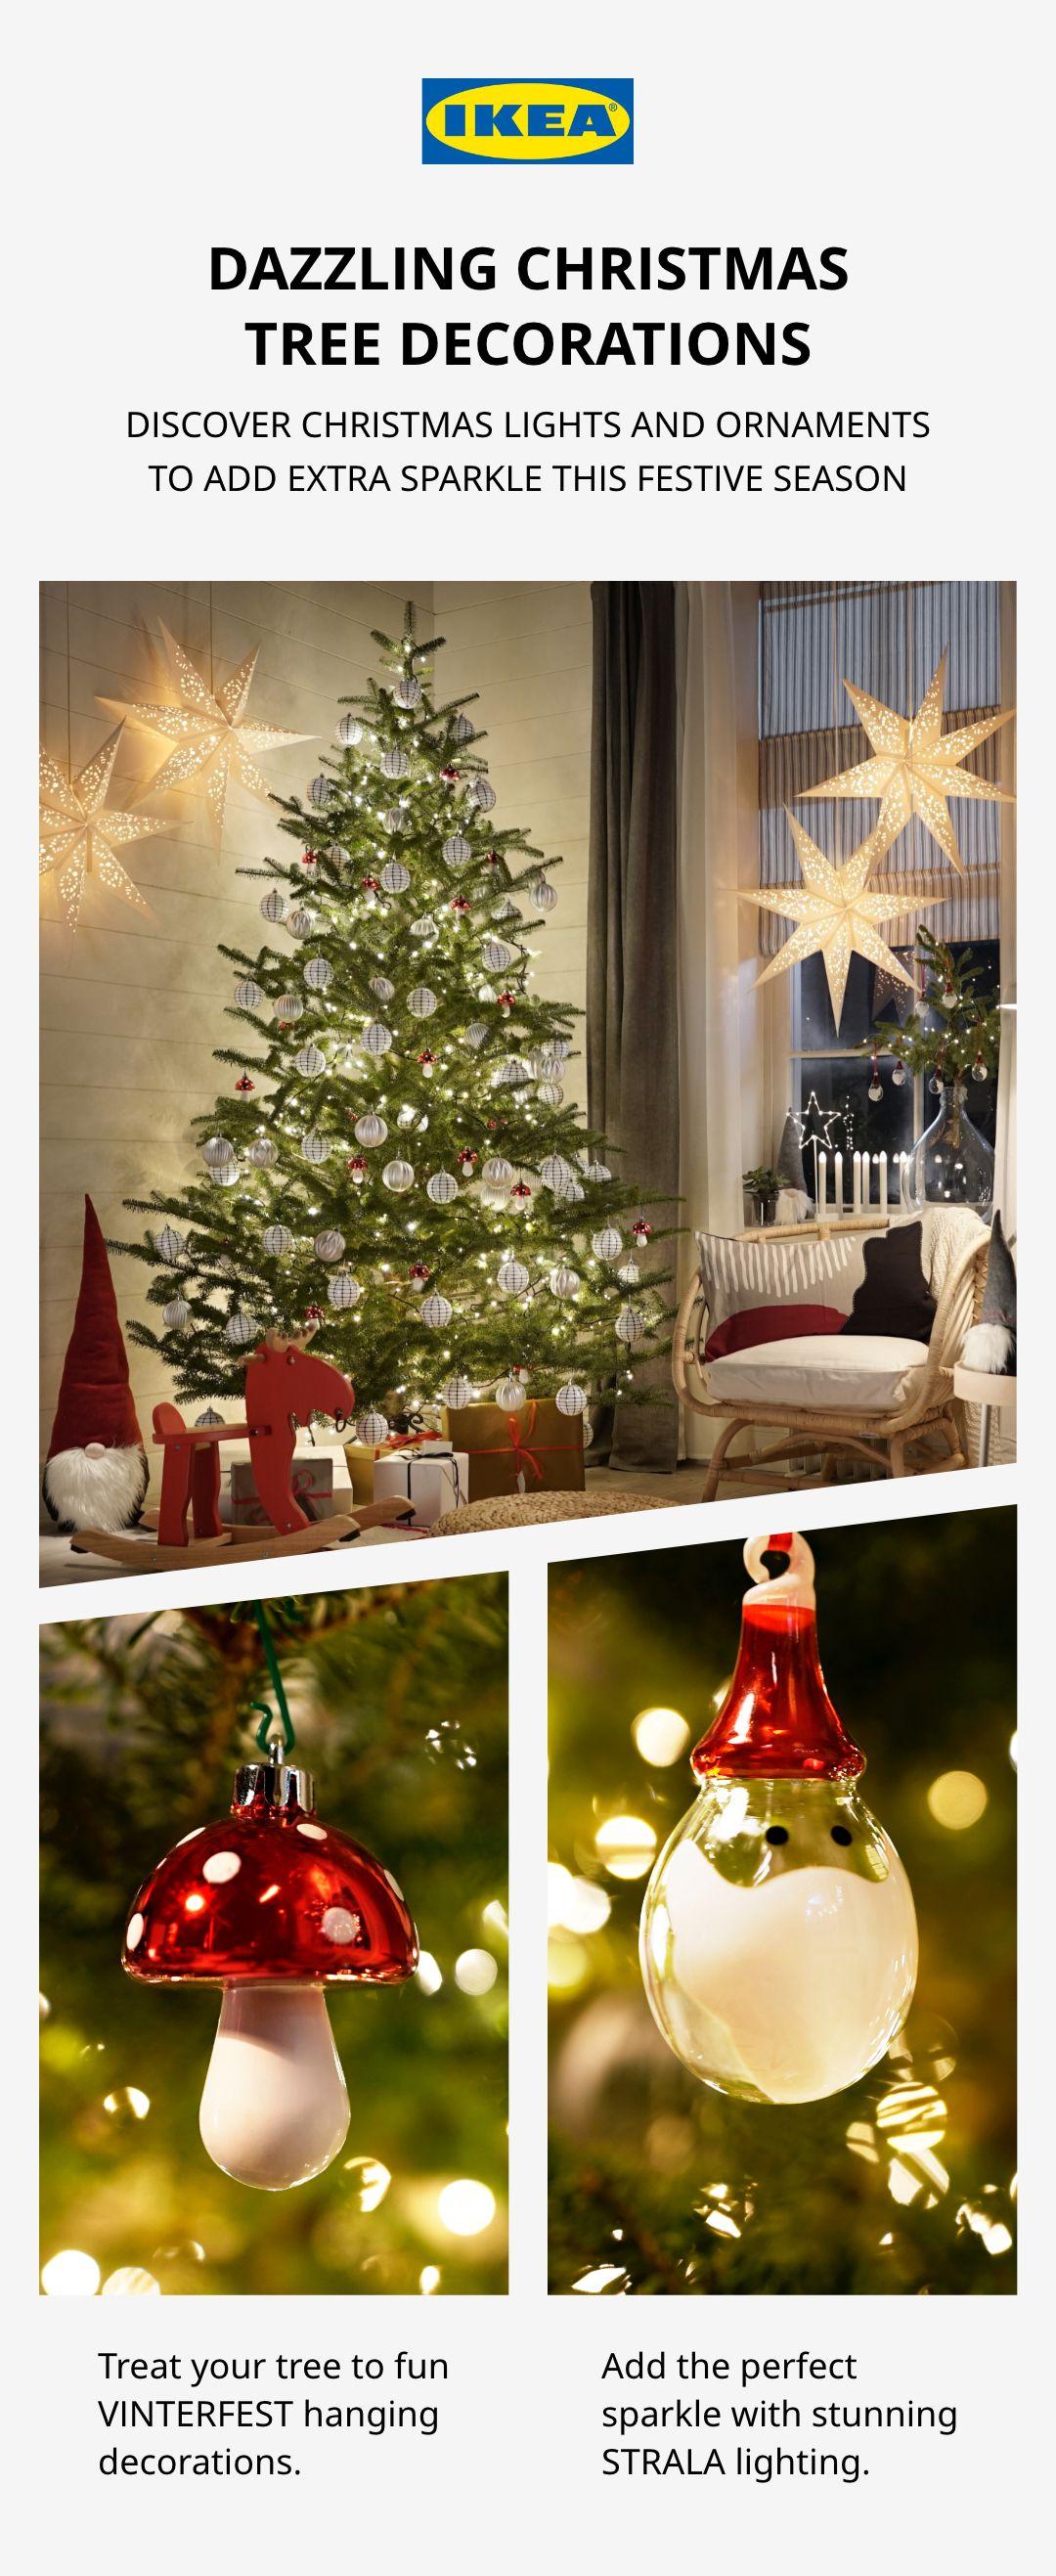 Dazzling Christmas tree decorations